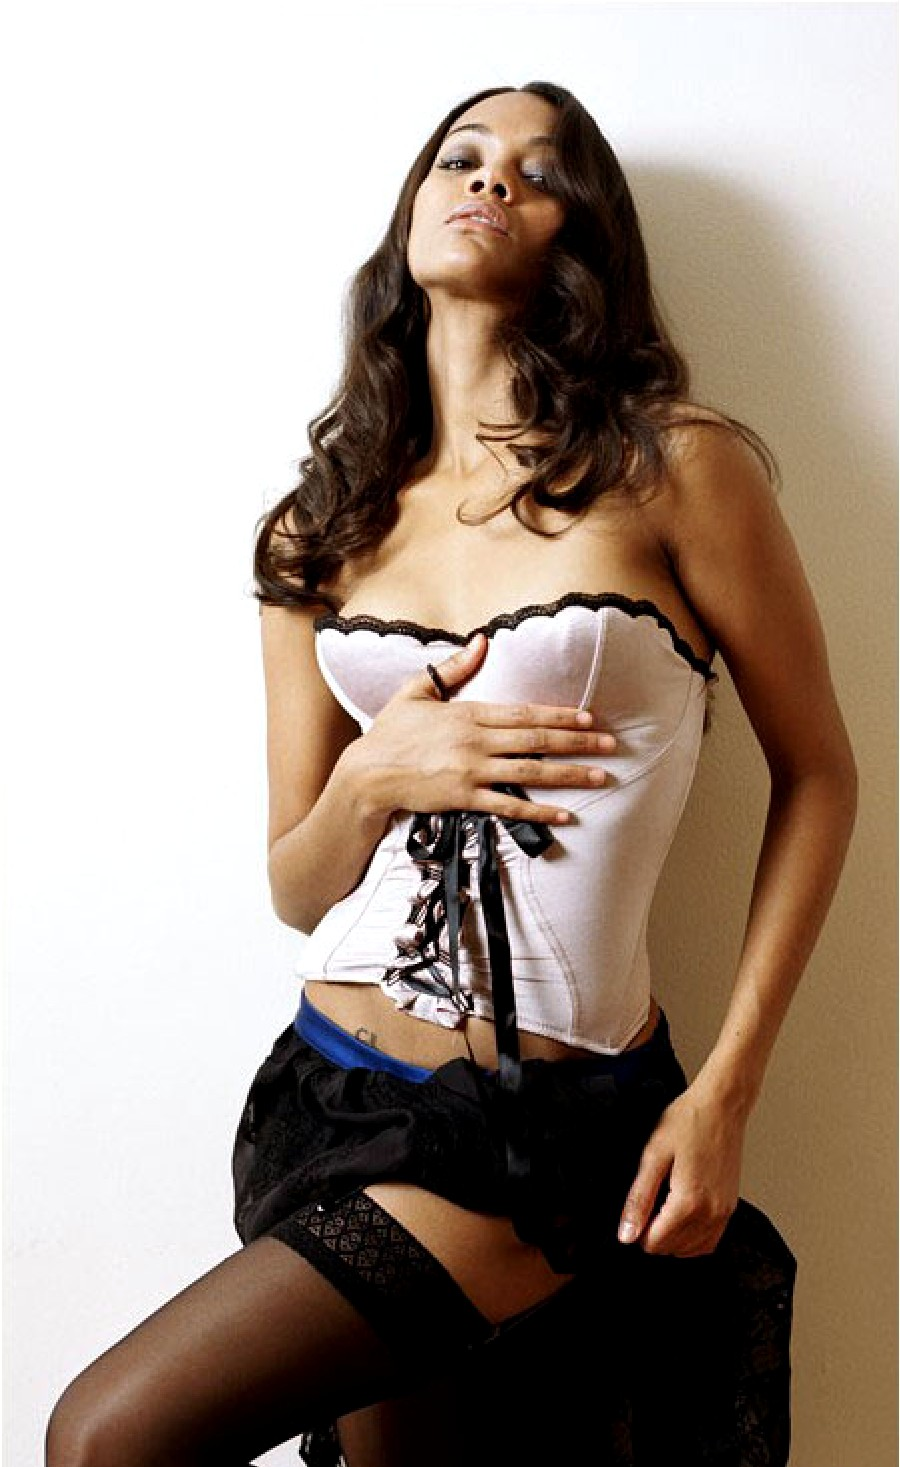 Zoe Saldana hot hd wallpapers - Sports Updates